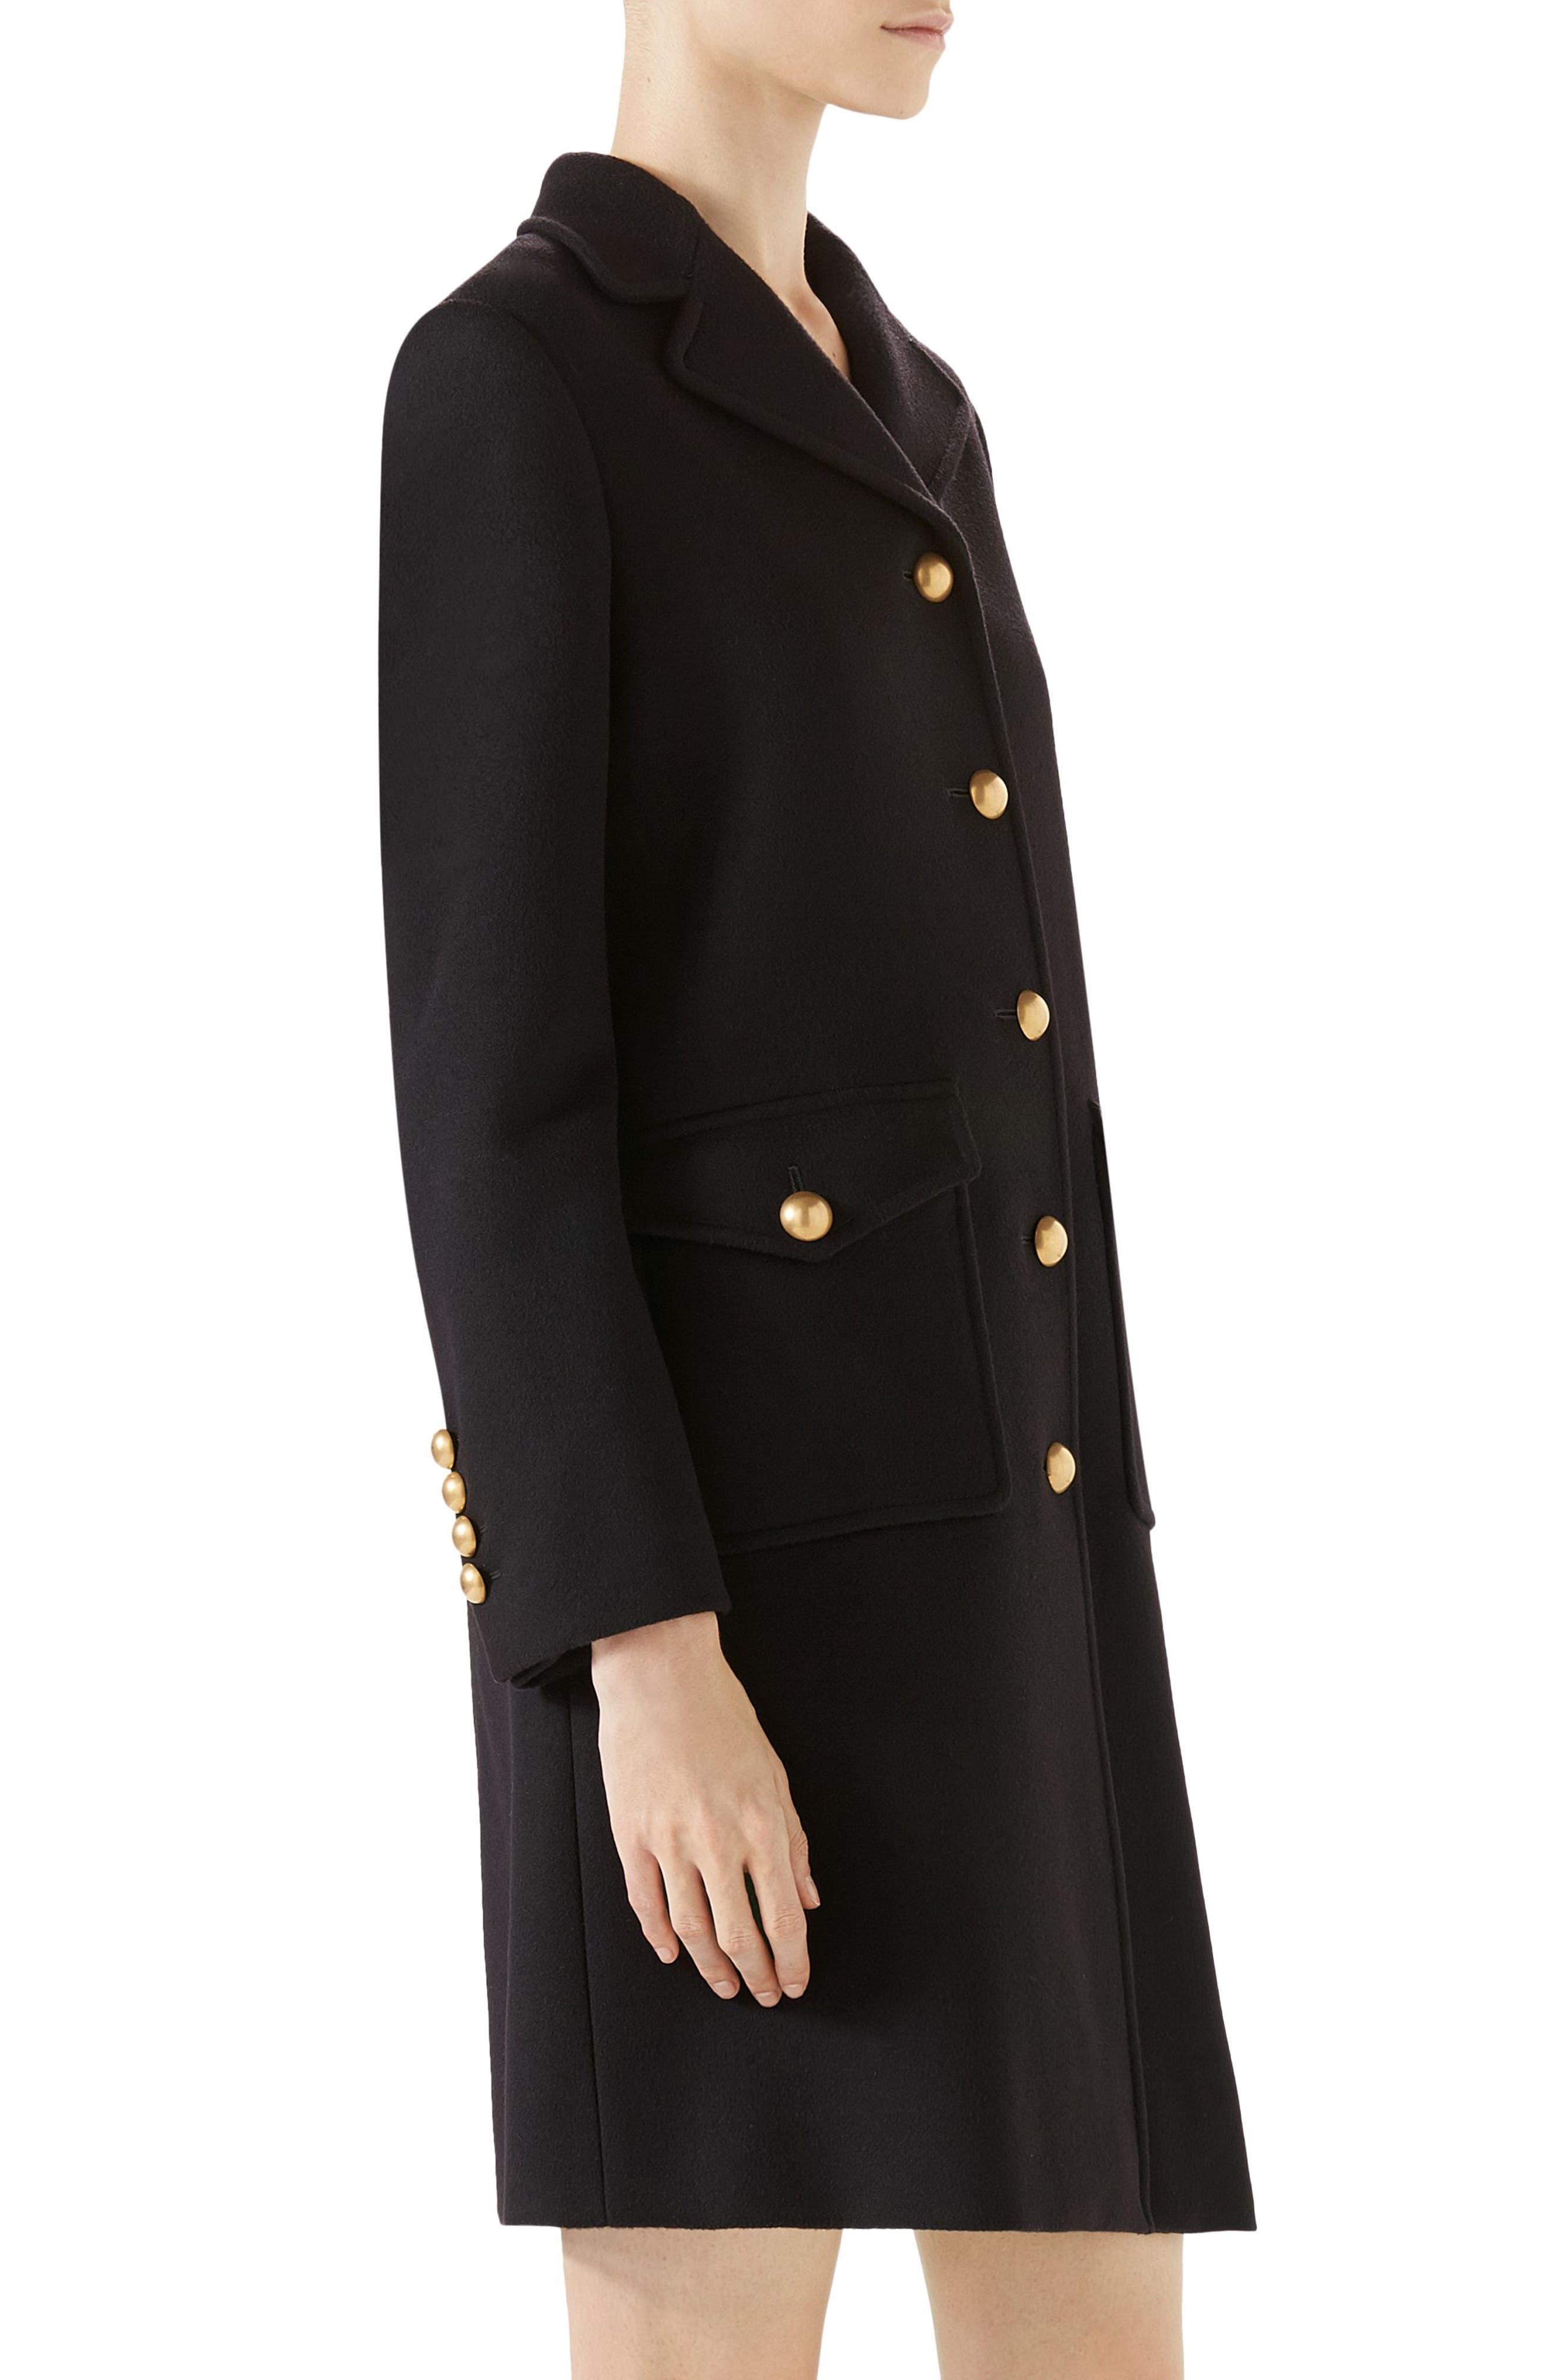 GG Wool Coat,                             Alternate thumbnail 3, color,                             Black